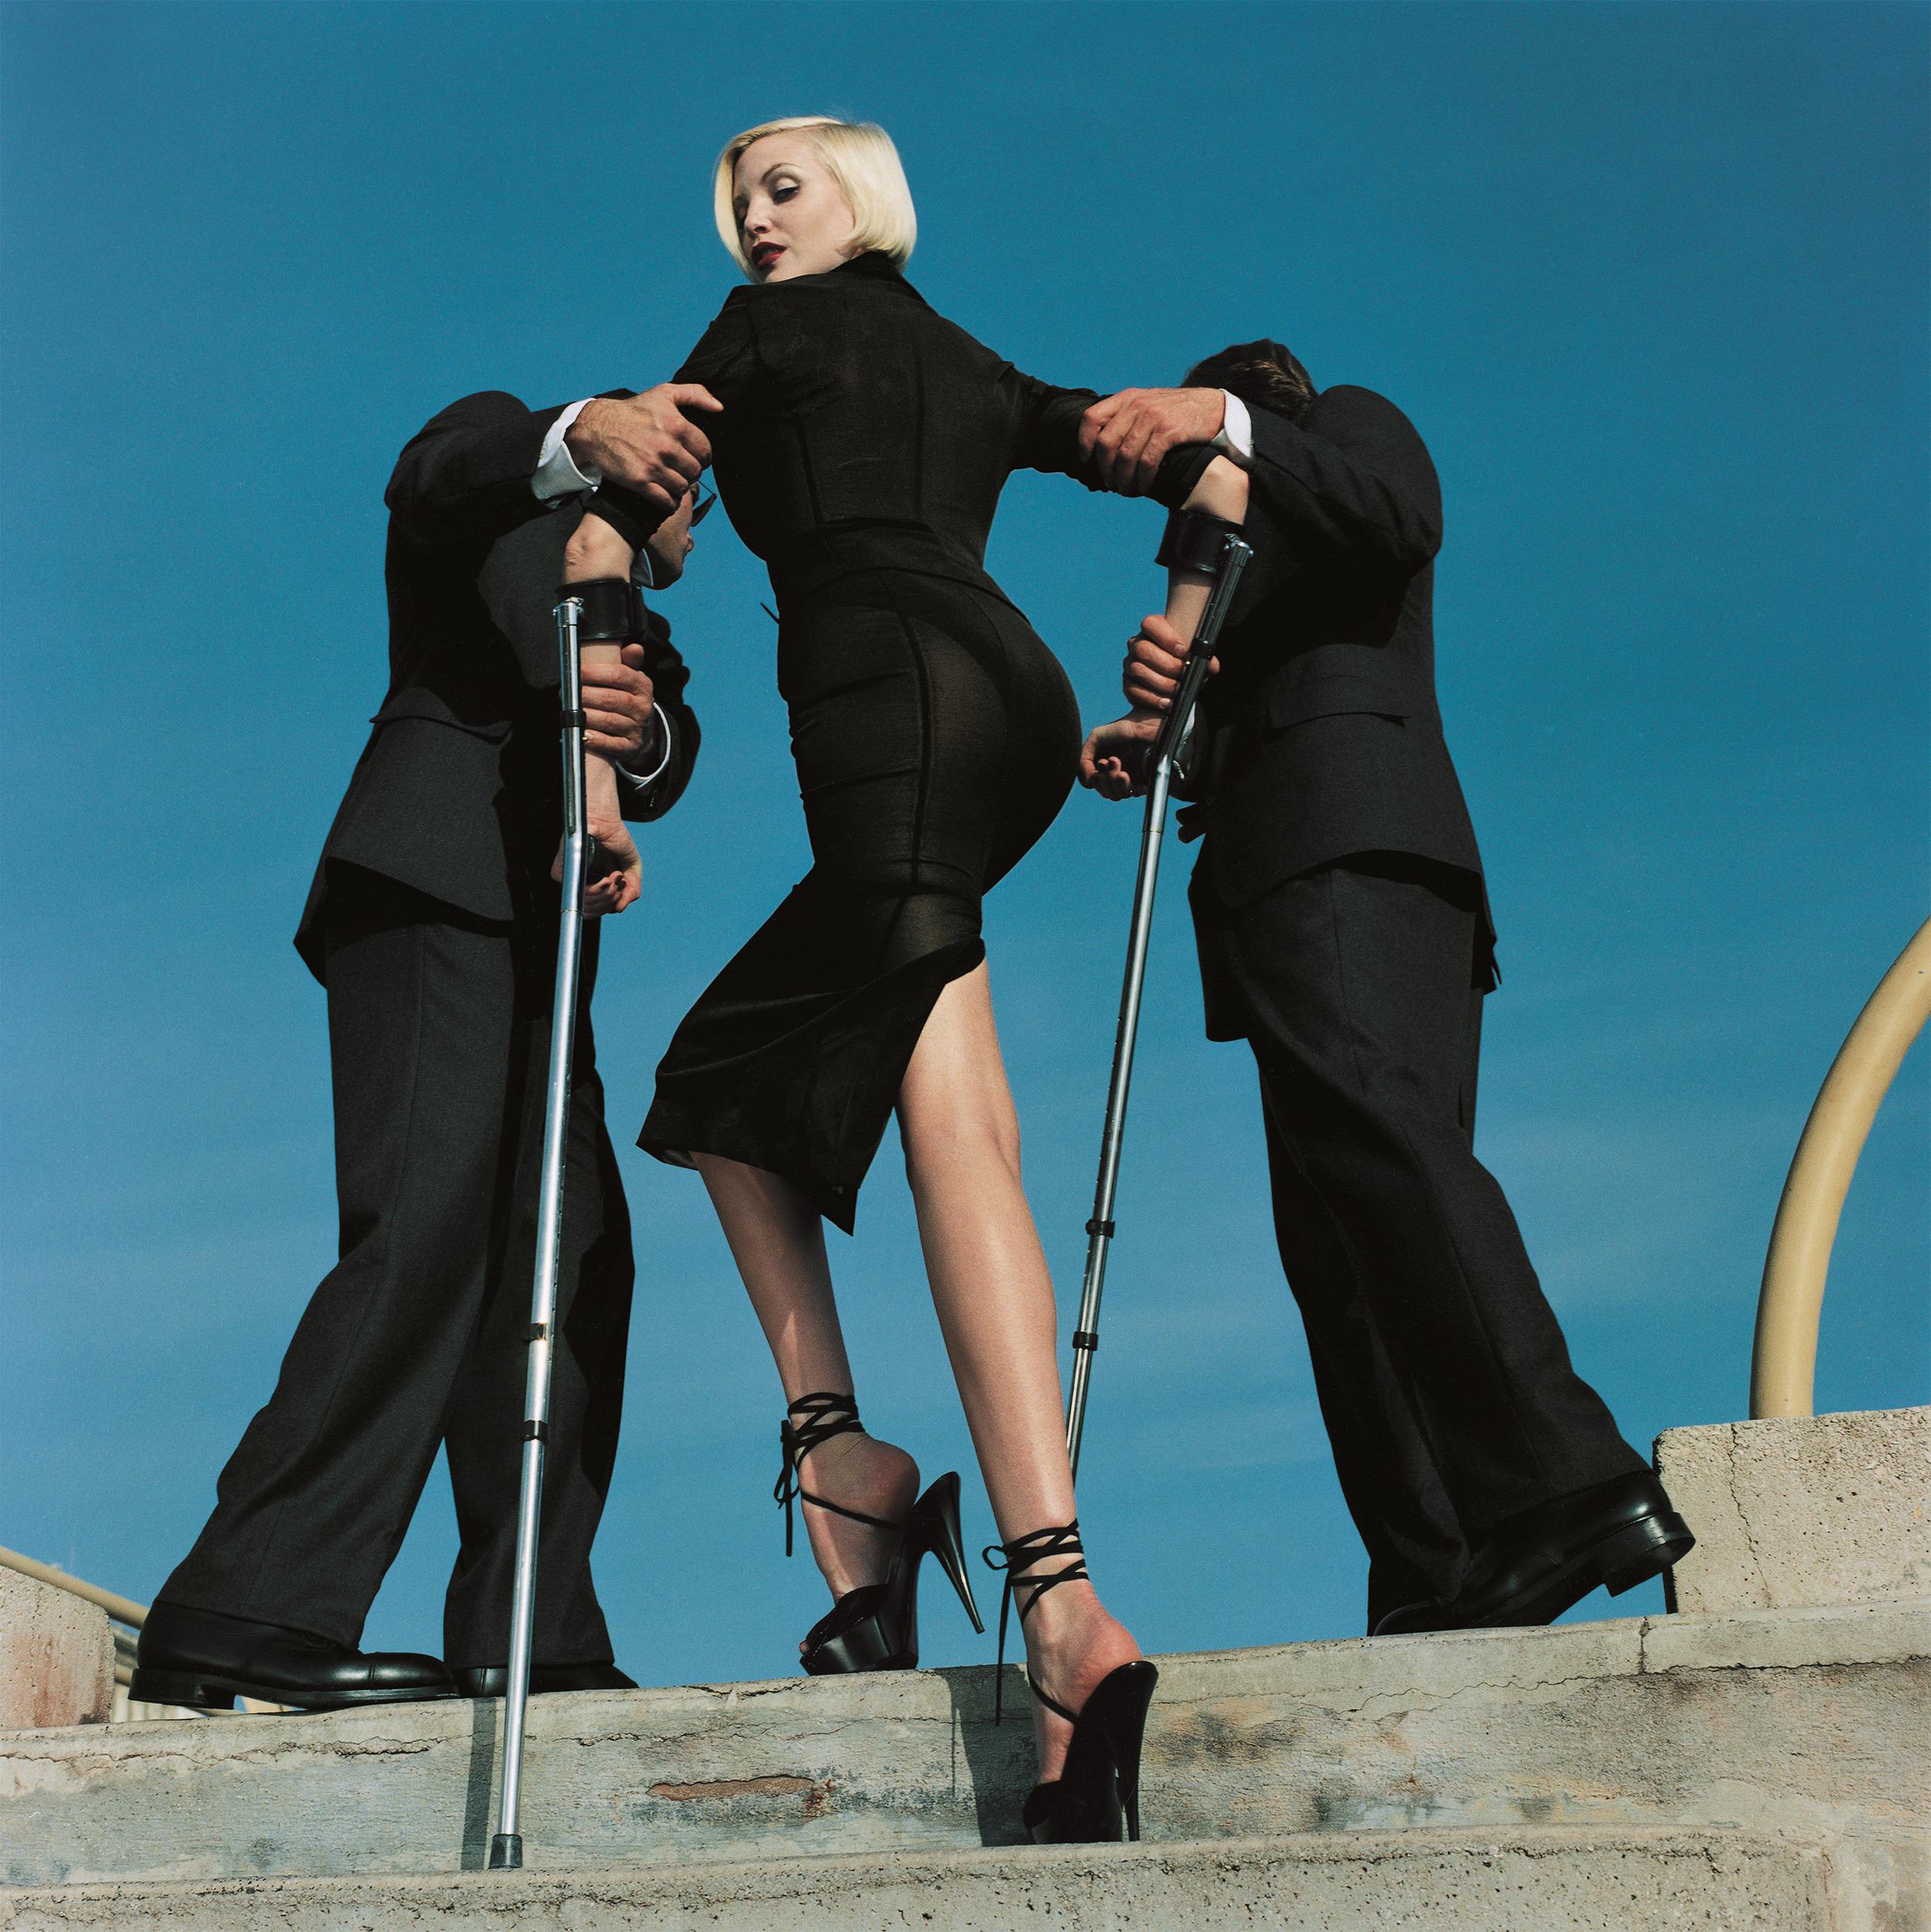 High & Mighty shoot, American Vogue Artist: (model: Nadja Auermann) Dolce & Gabbana suit, Summer 1995 Date: February 1995 © Estate of Helmut Newton / Maconochie Photography